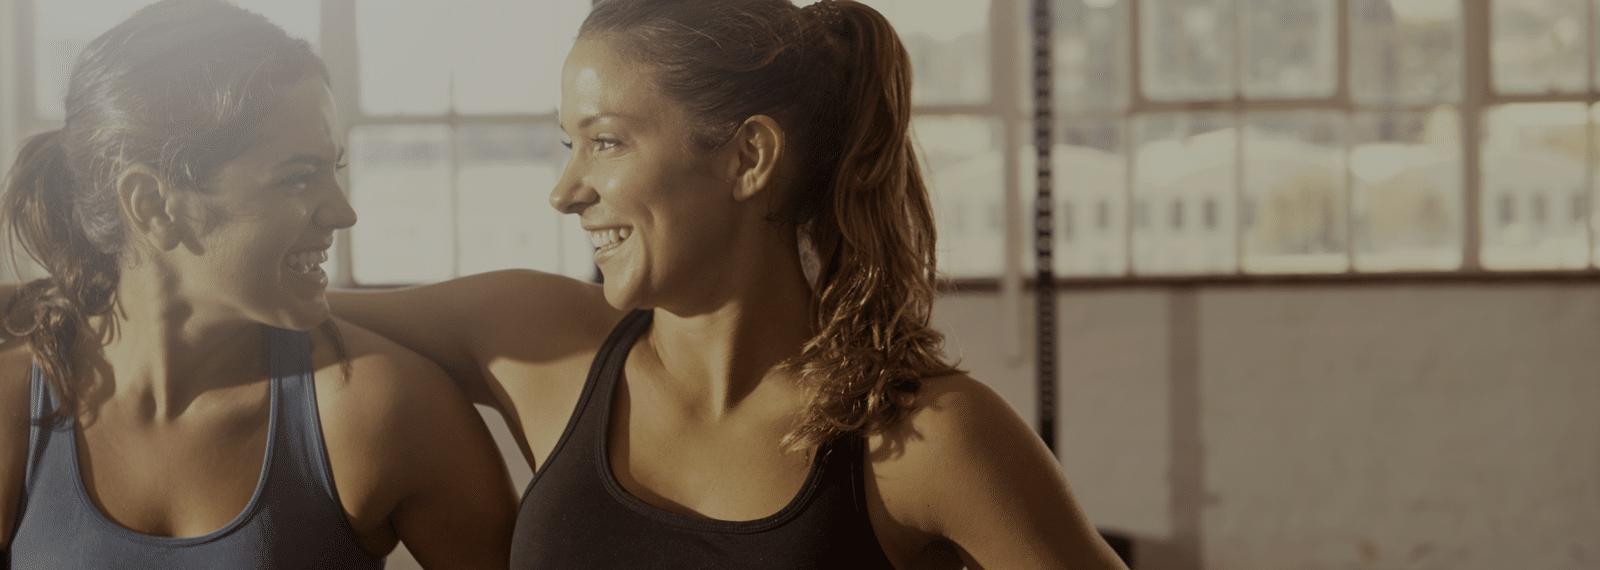 Starke-Frauen-im-Fitness-Loft-1600x570px